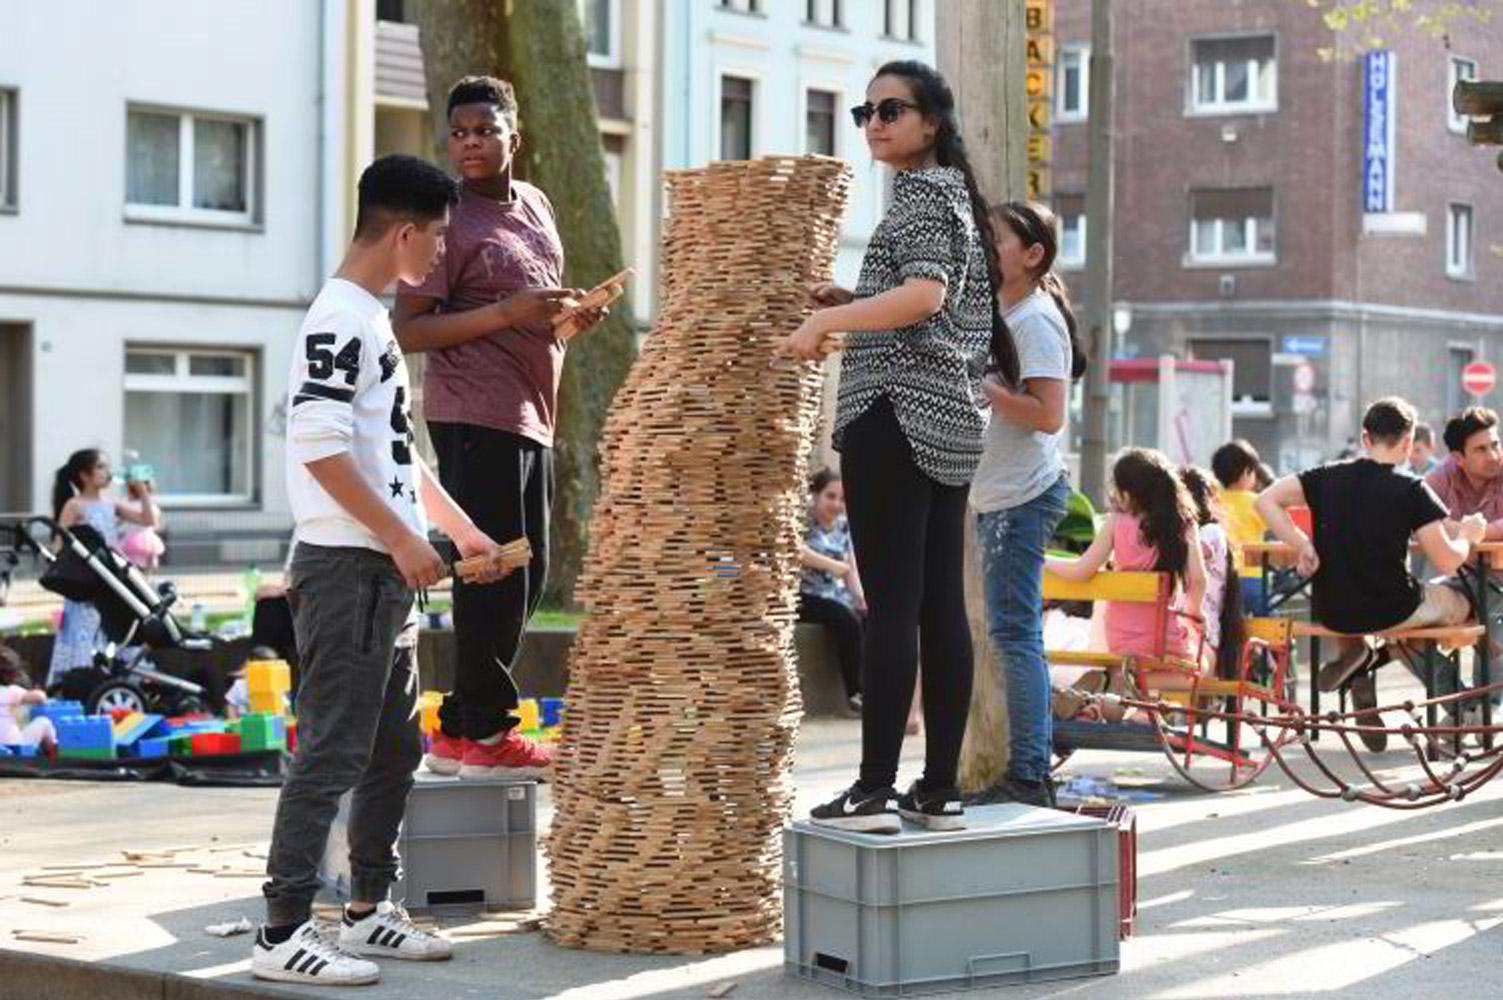 Aktion Mobifant auf dem Albrechtplatz, April 2018